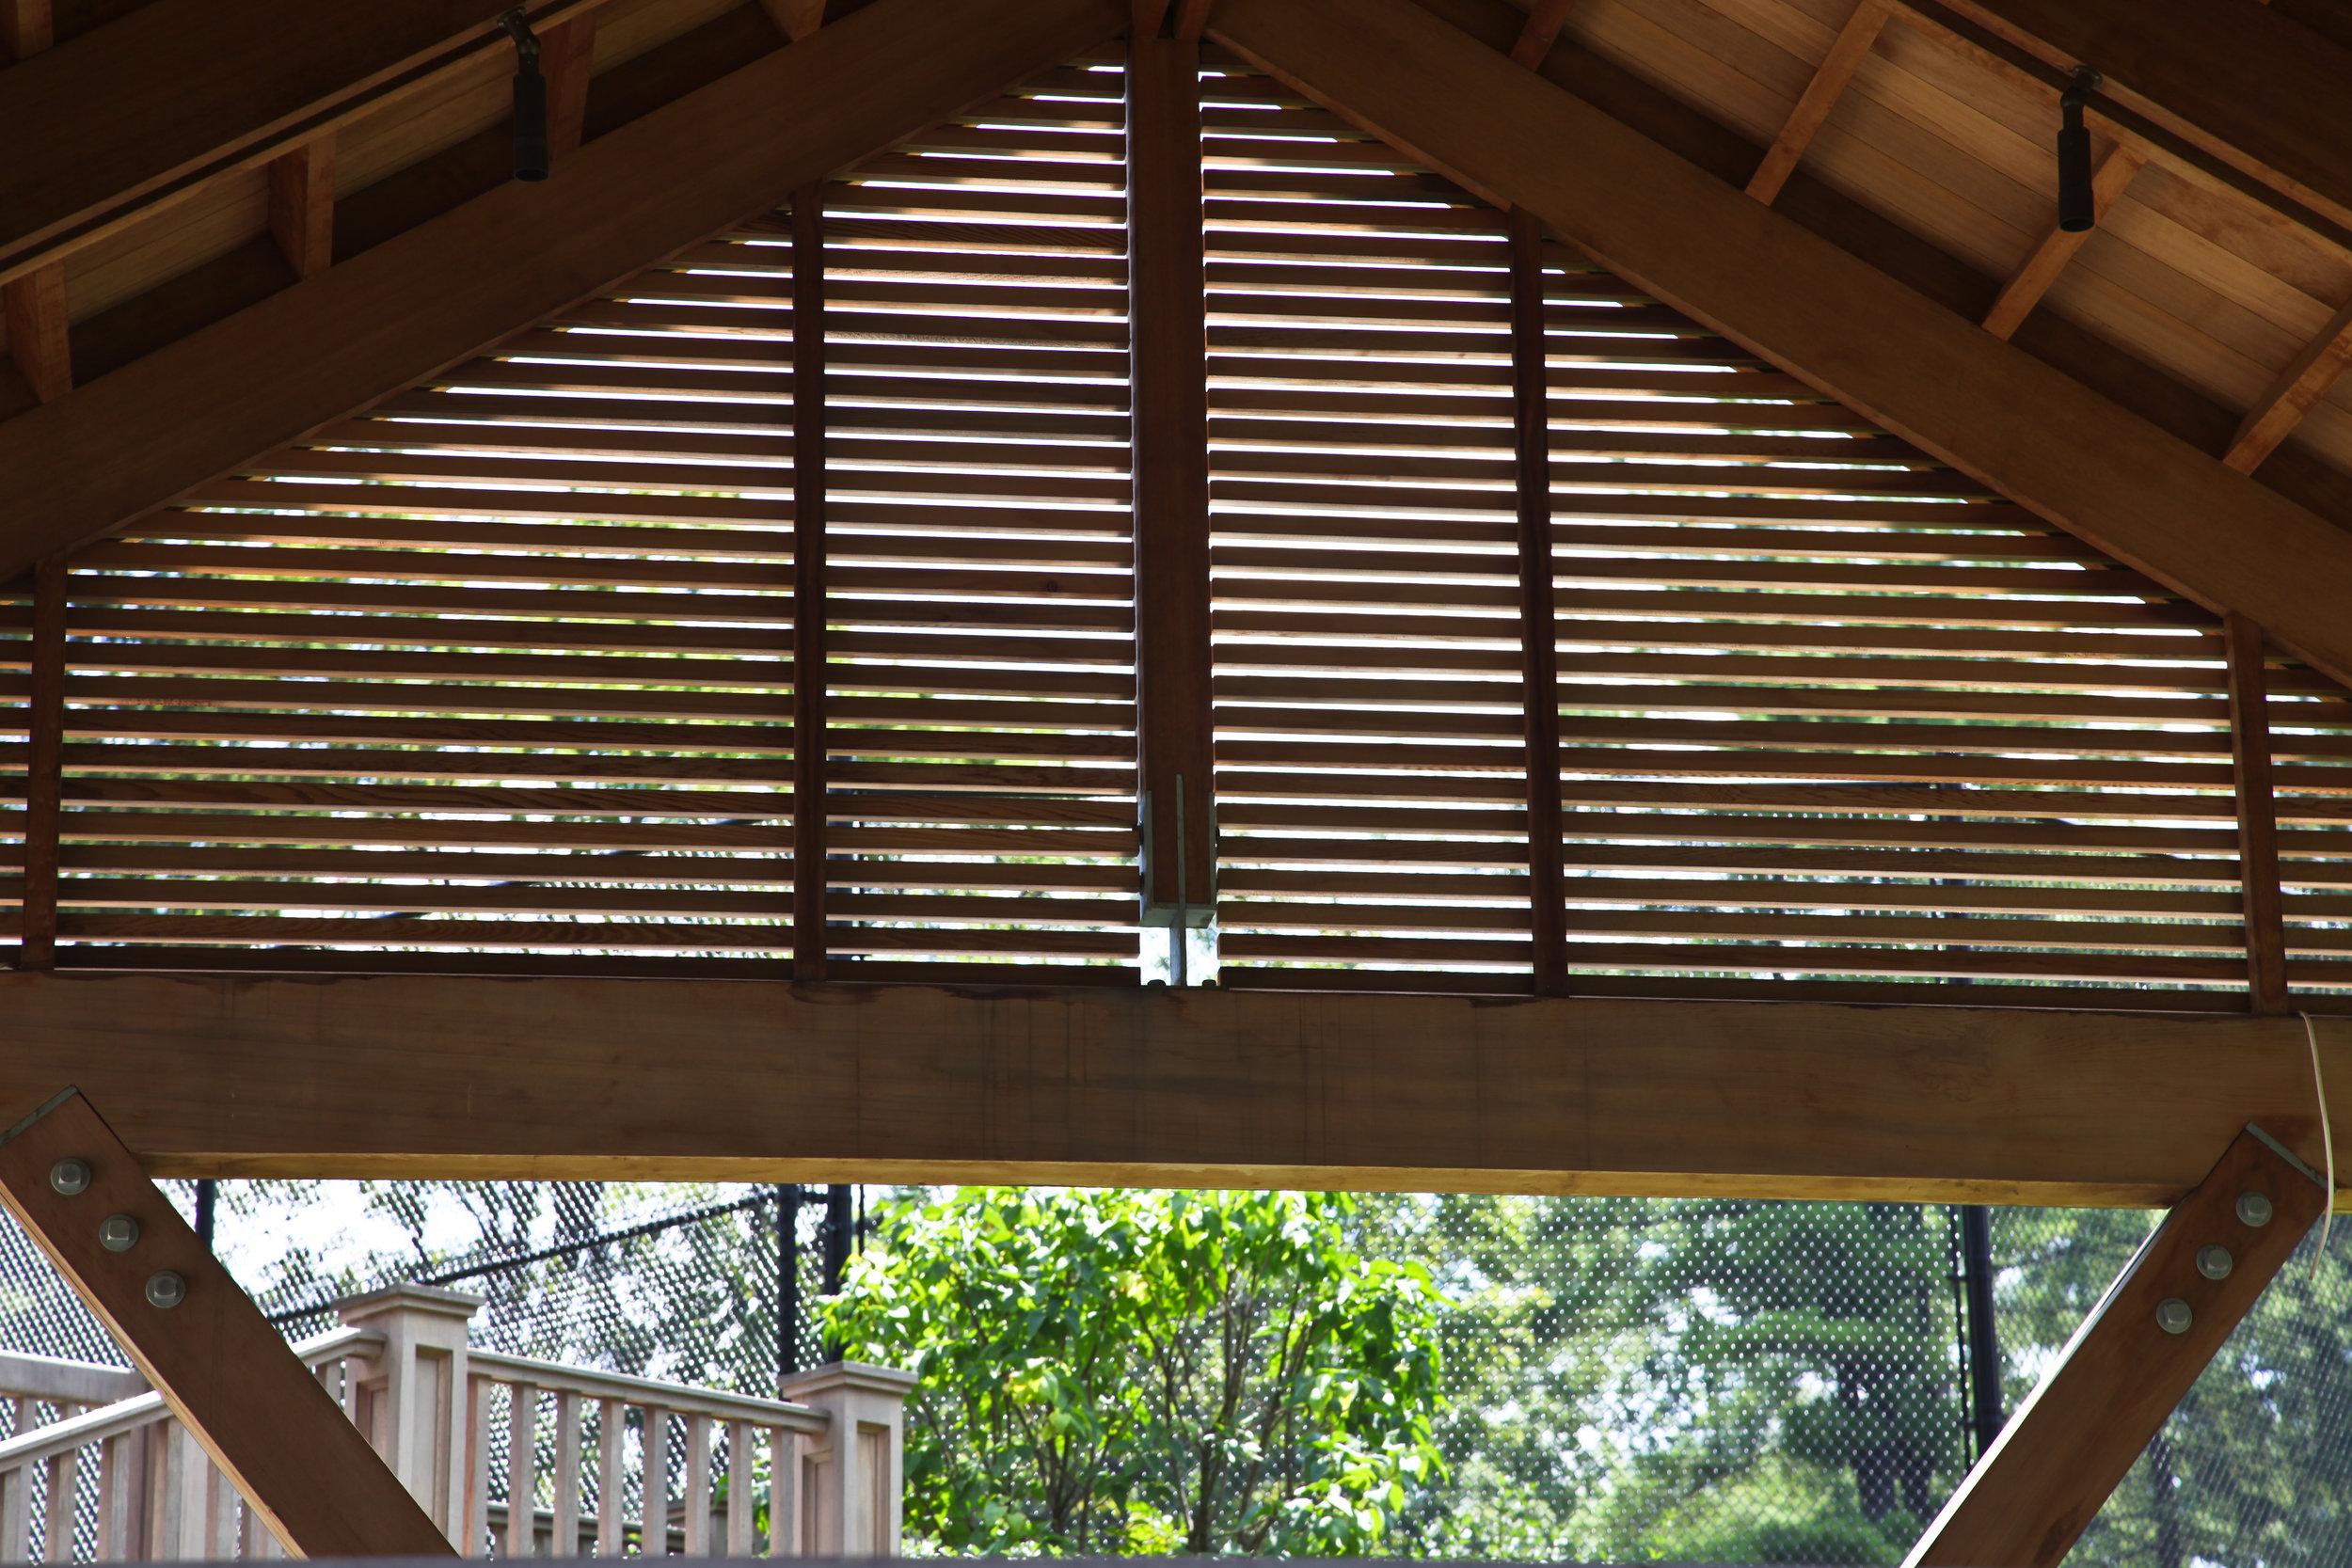 details wooden gazebo poolside relaxation